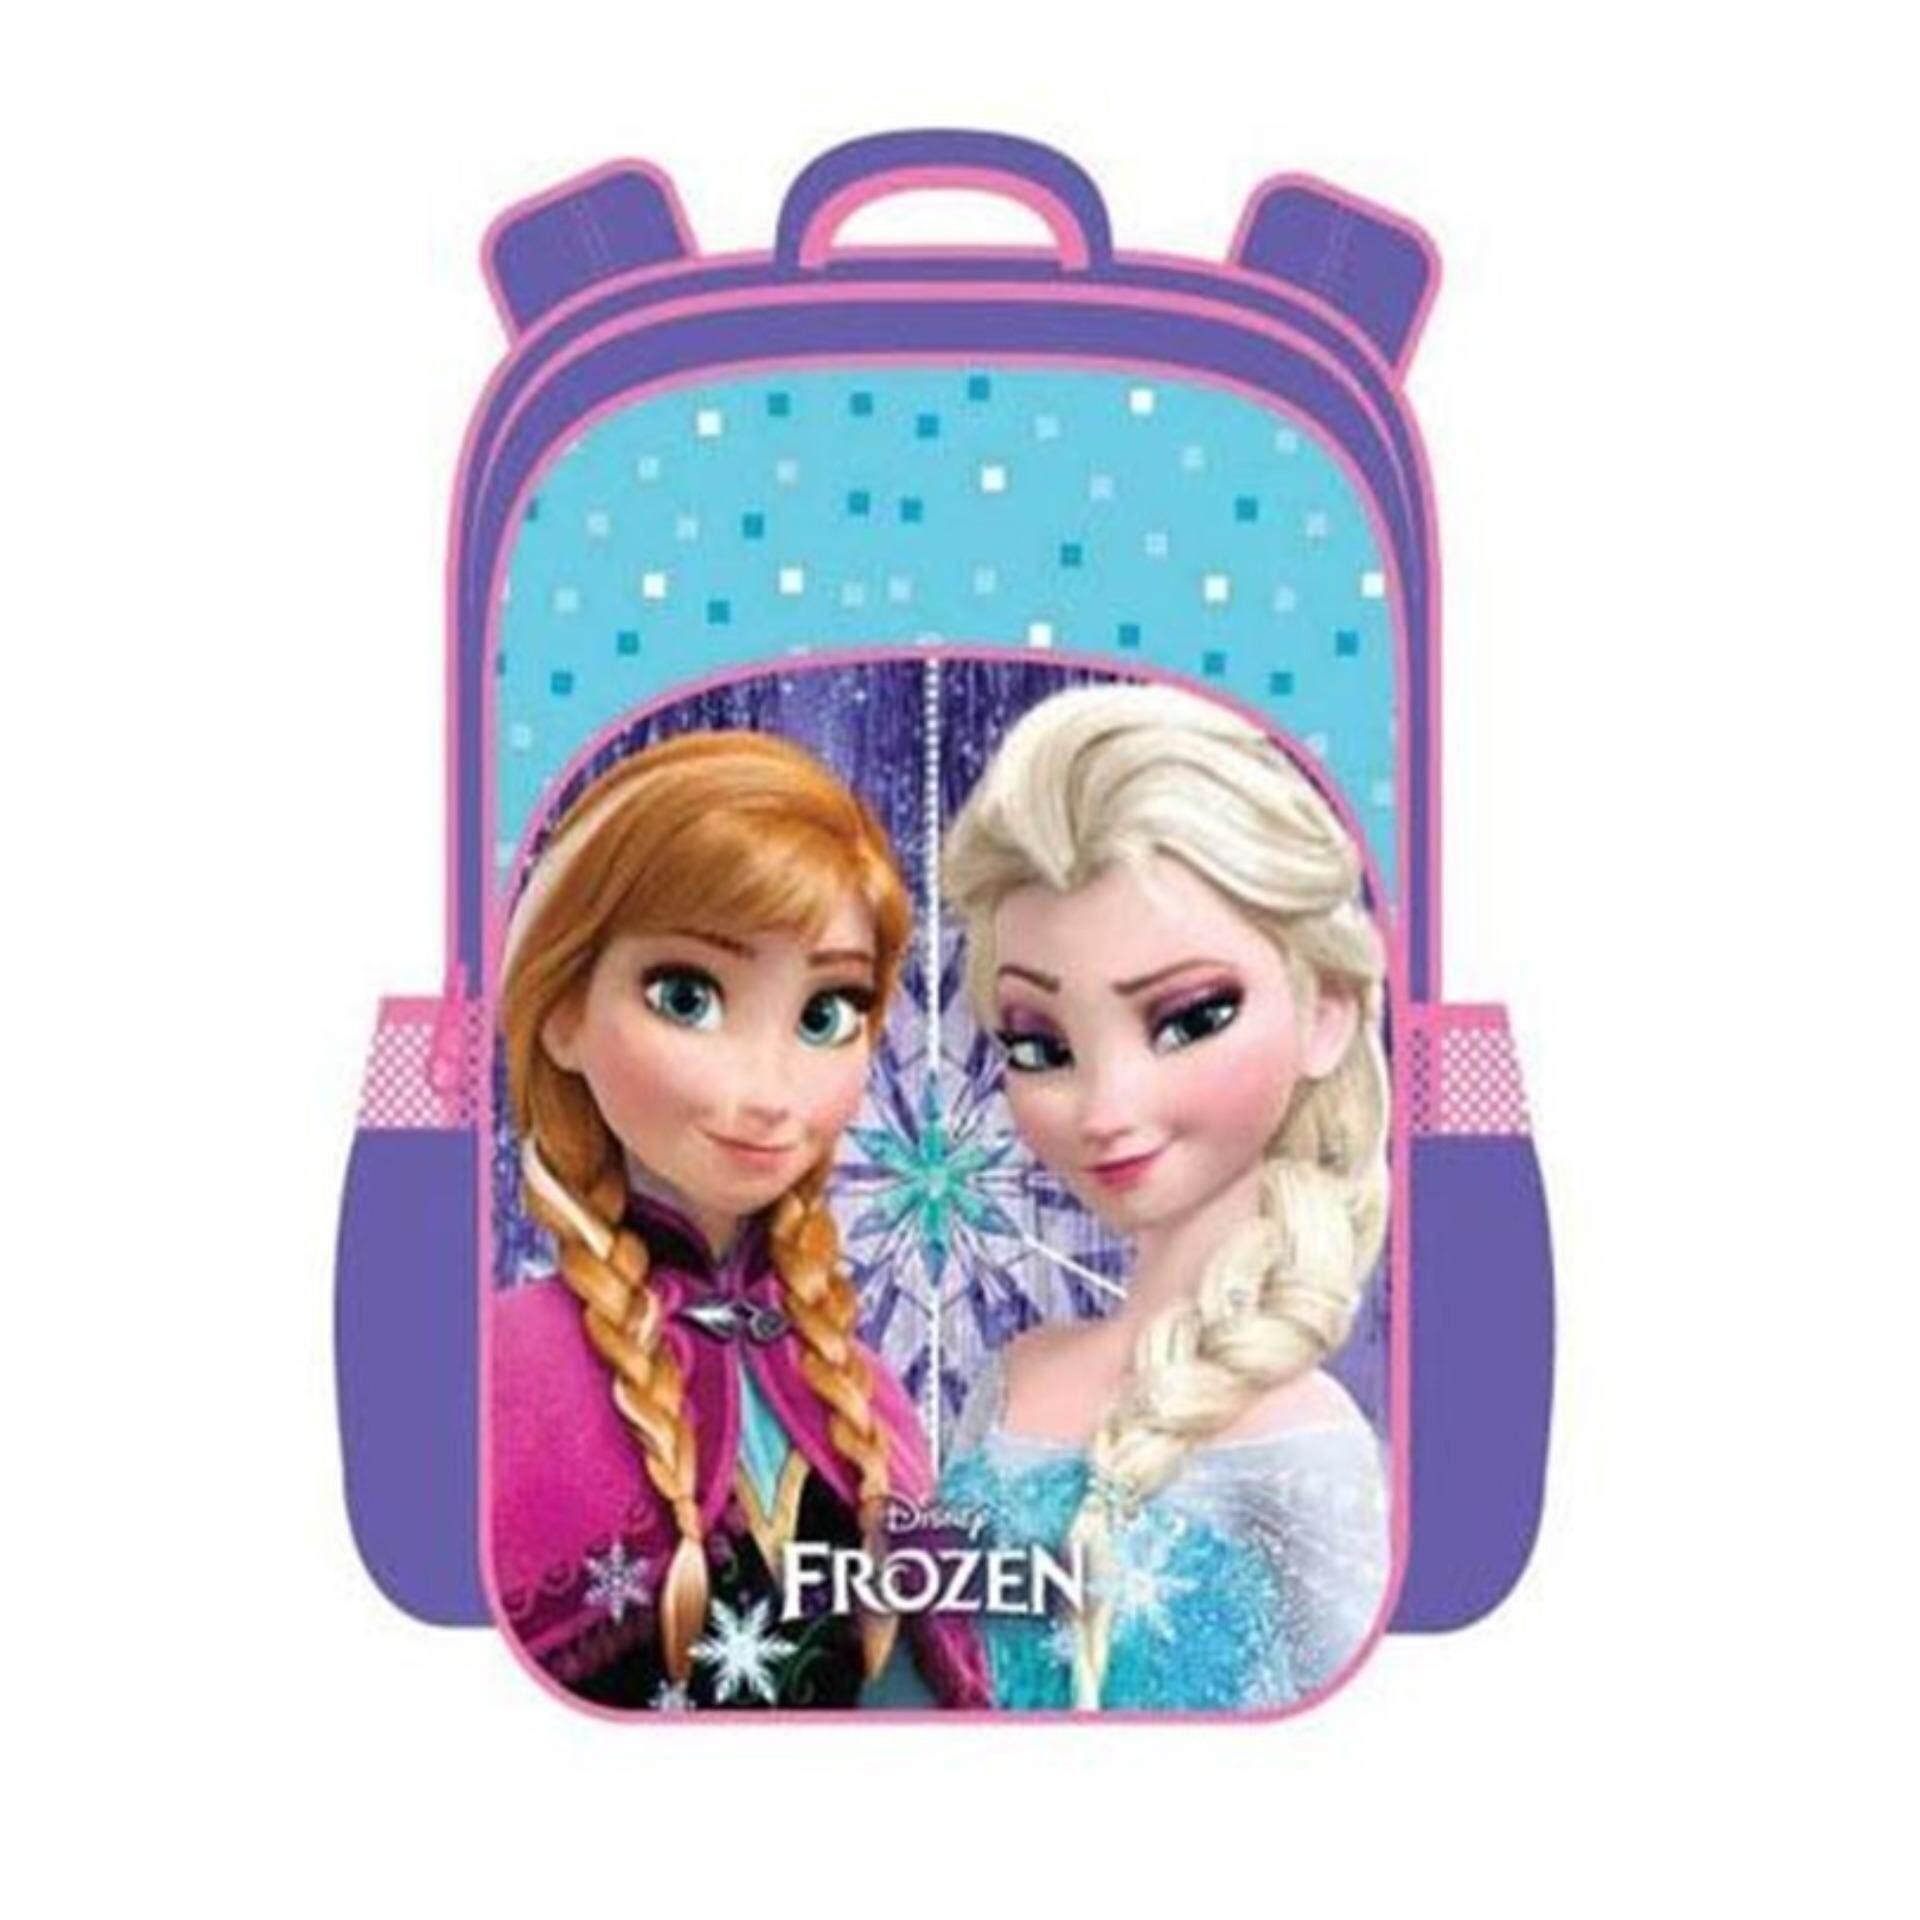 Disney Princess Frozen Pre School Backpack Kindergarten Nursery Kids Children School Bag - Blue Colour